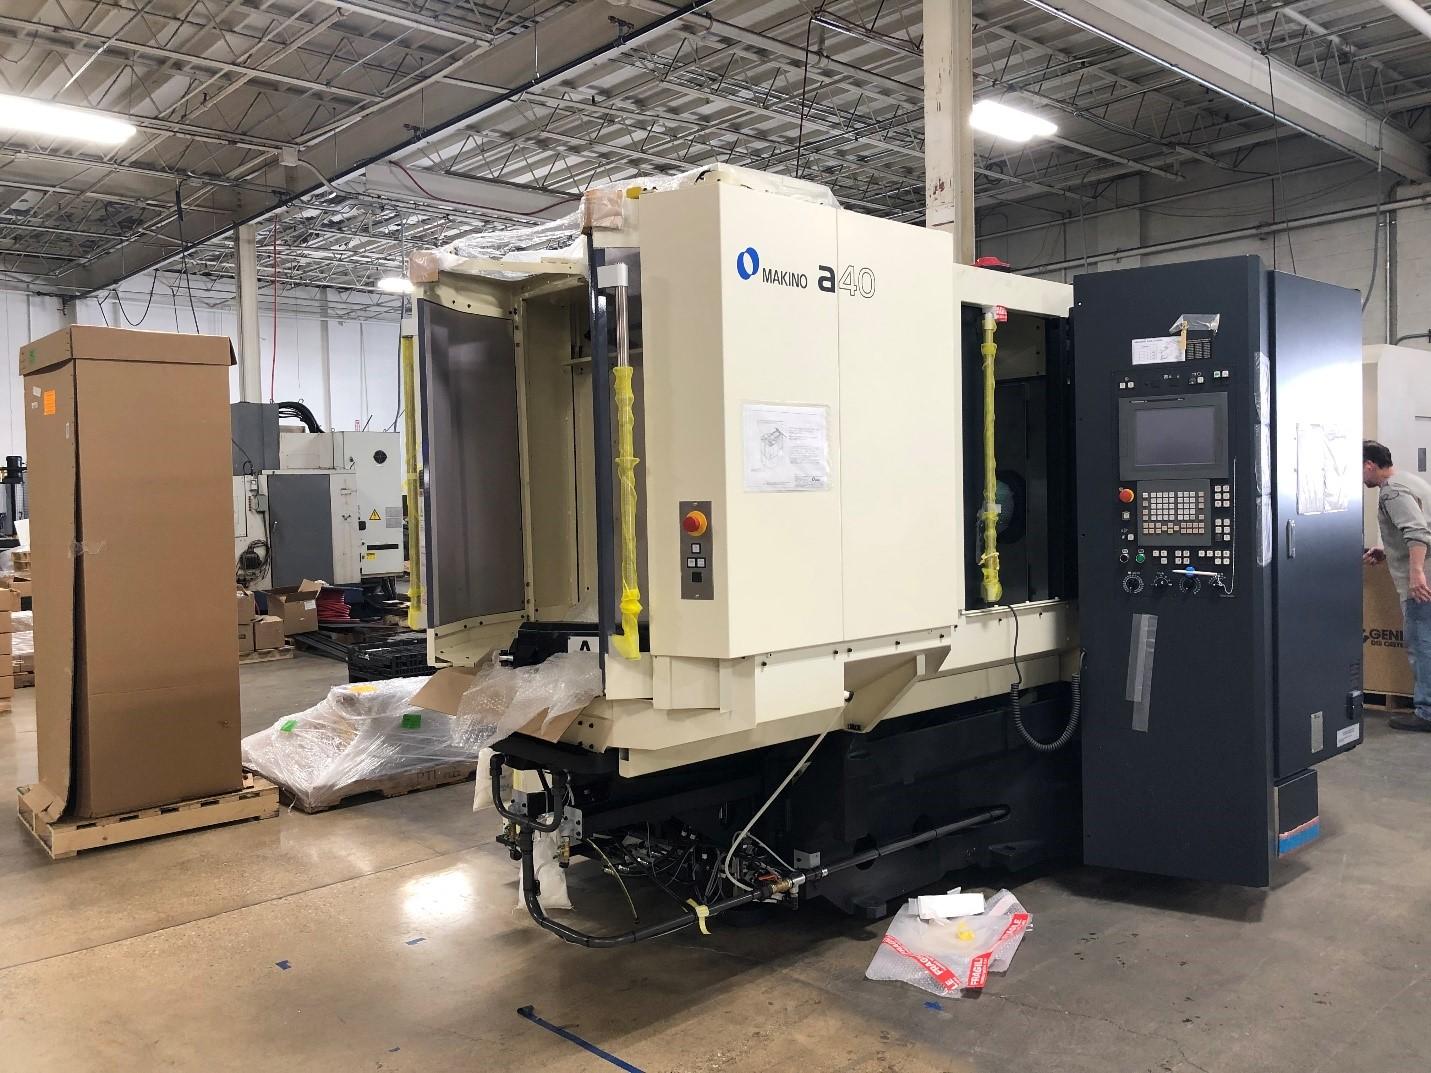 Makino A40 Horizontal machining center